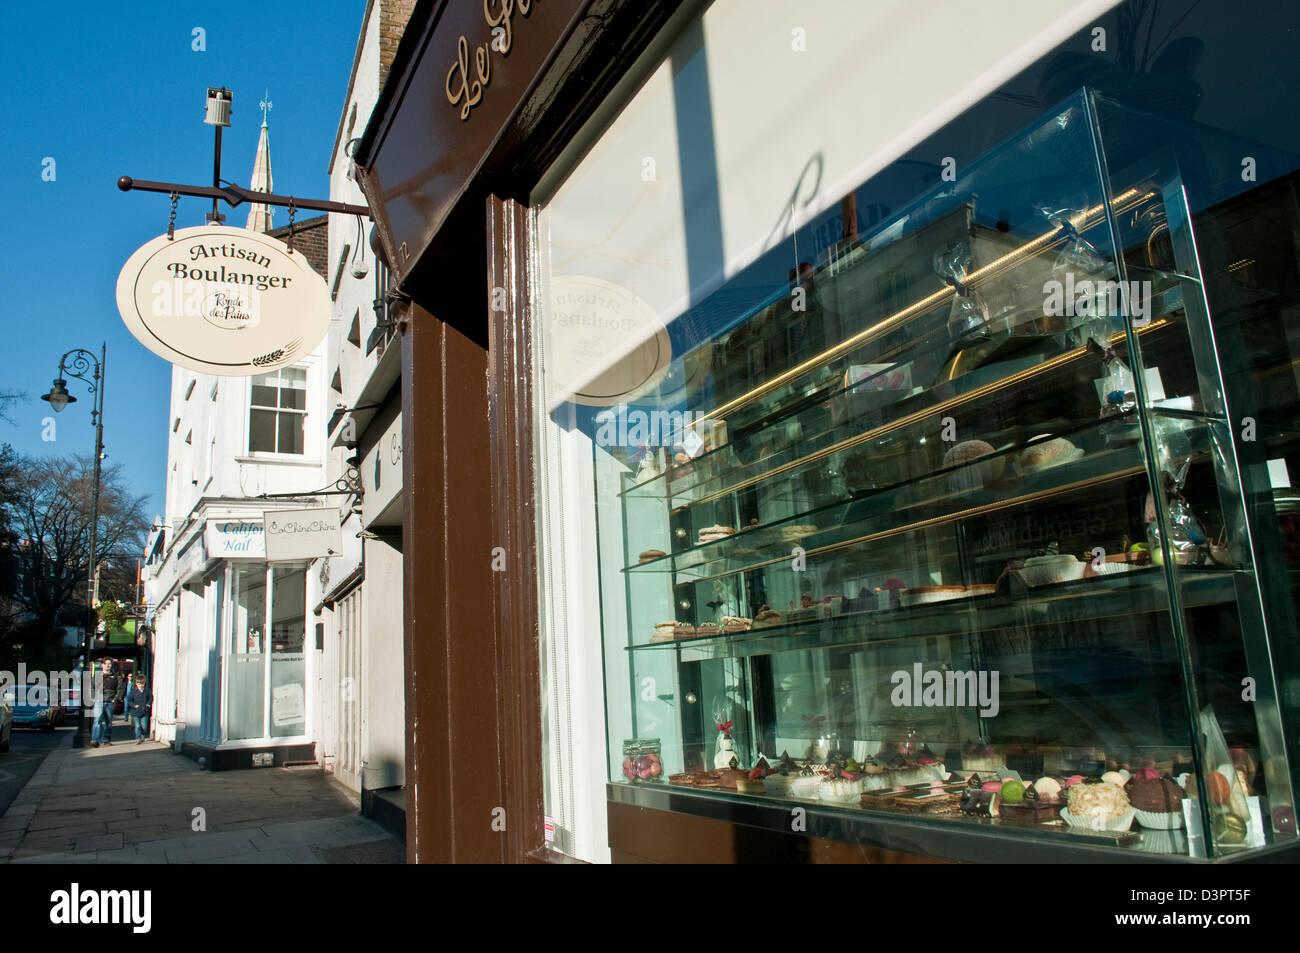 Artisan Boulanger, Heath Street, Hampstead, London, UK - Stock Image